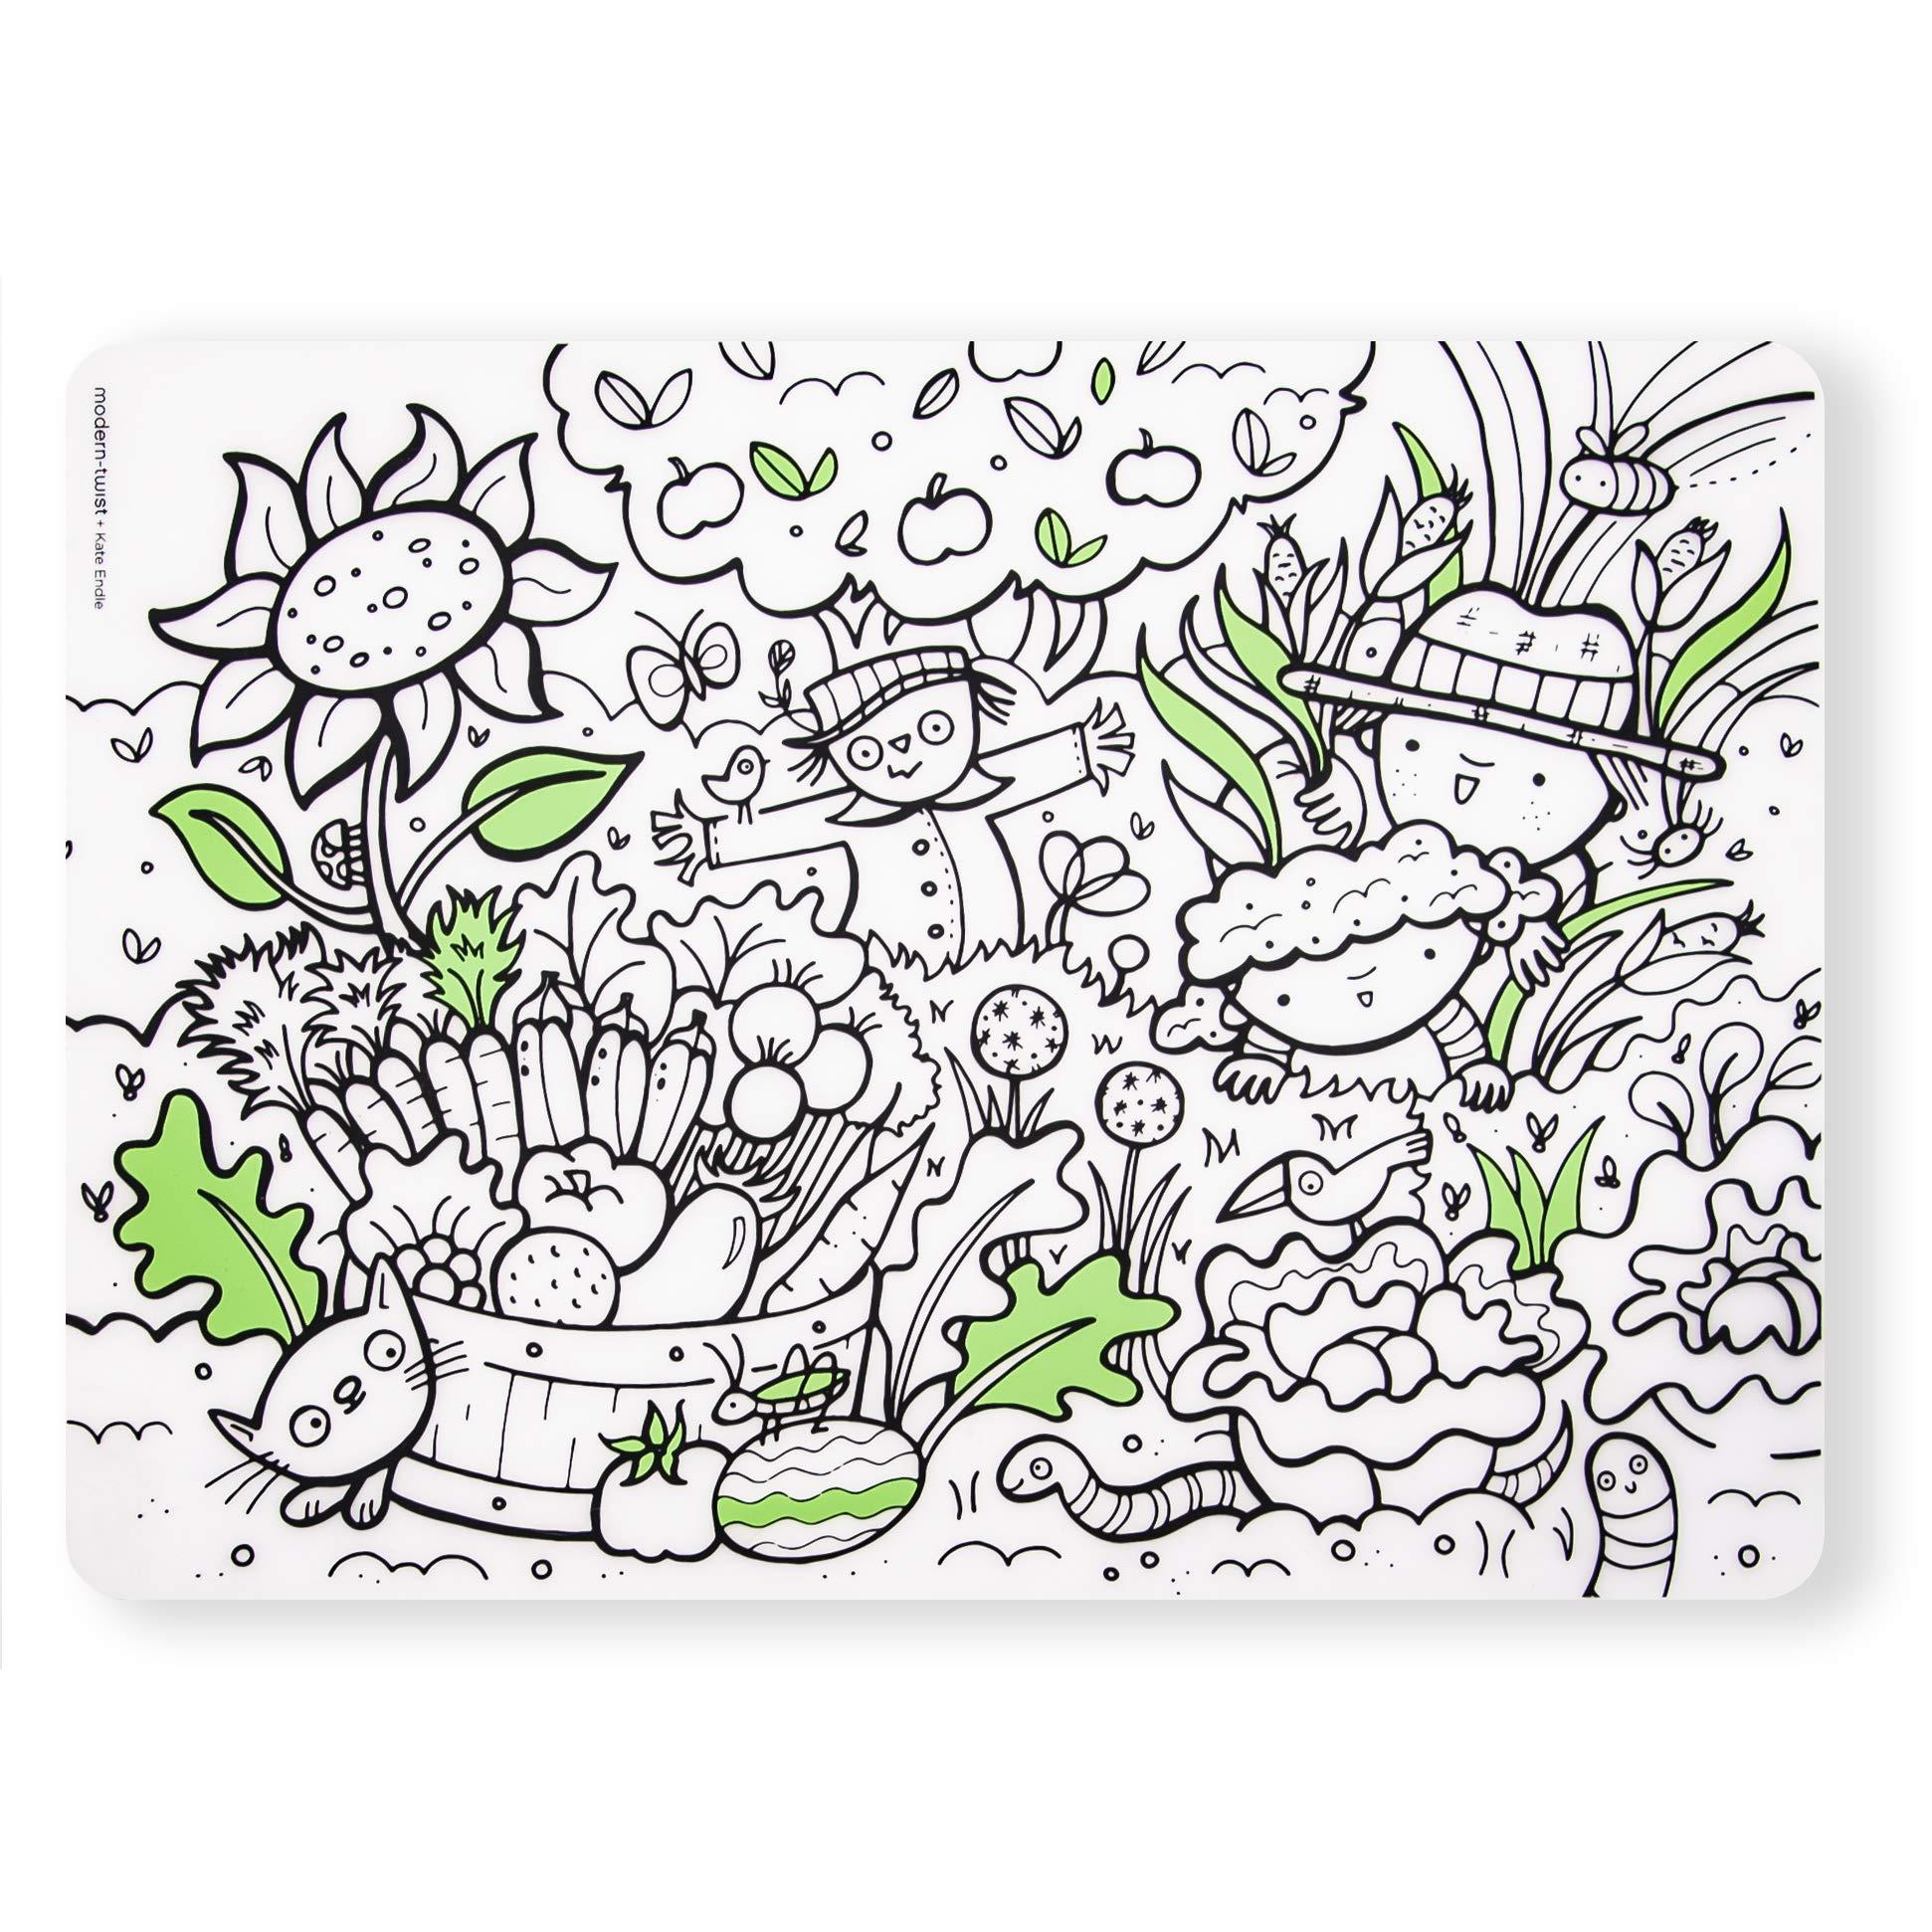 modern-twist 100% plastic free silicone, waterproof, dishwasher safe, Mark-Mat, Single Mat, Garden Play